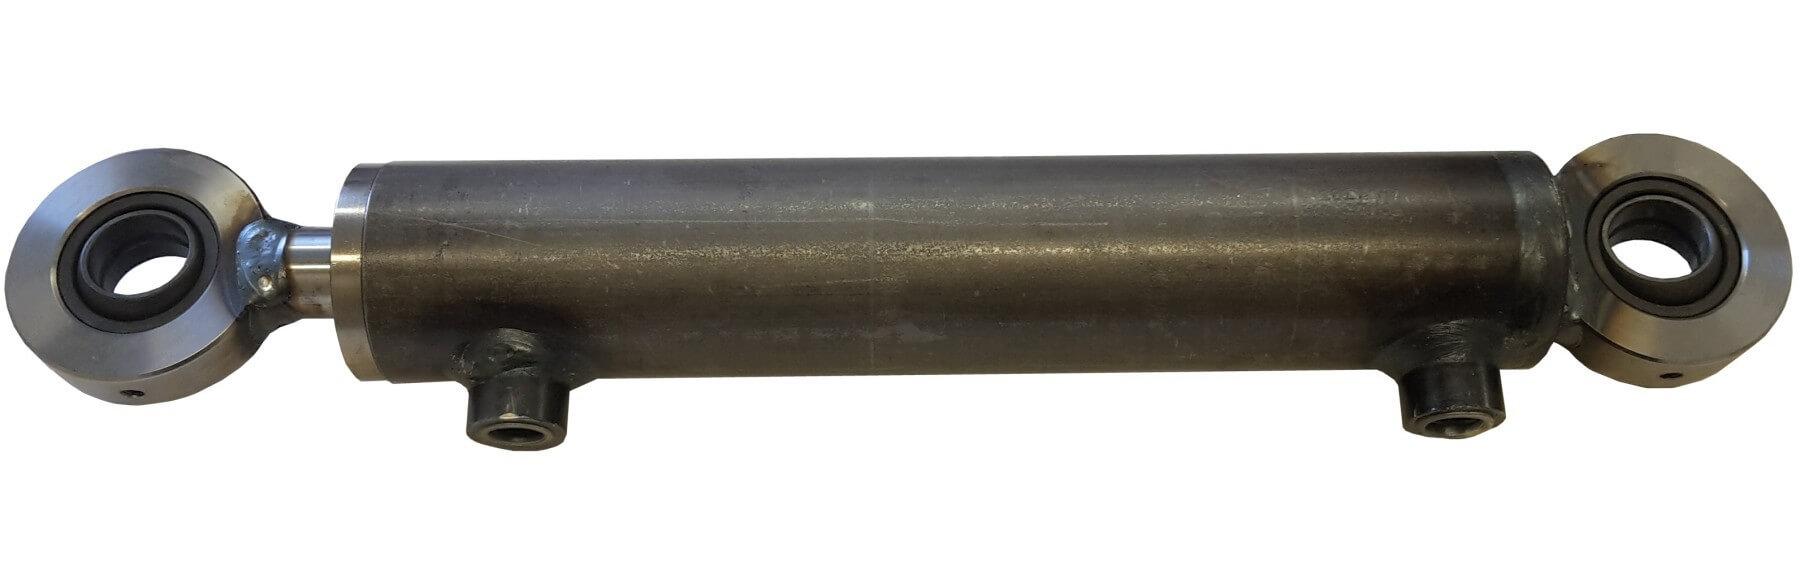 Hydraulisylinteri CL 40. 25. 300 GE